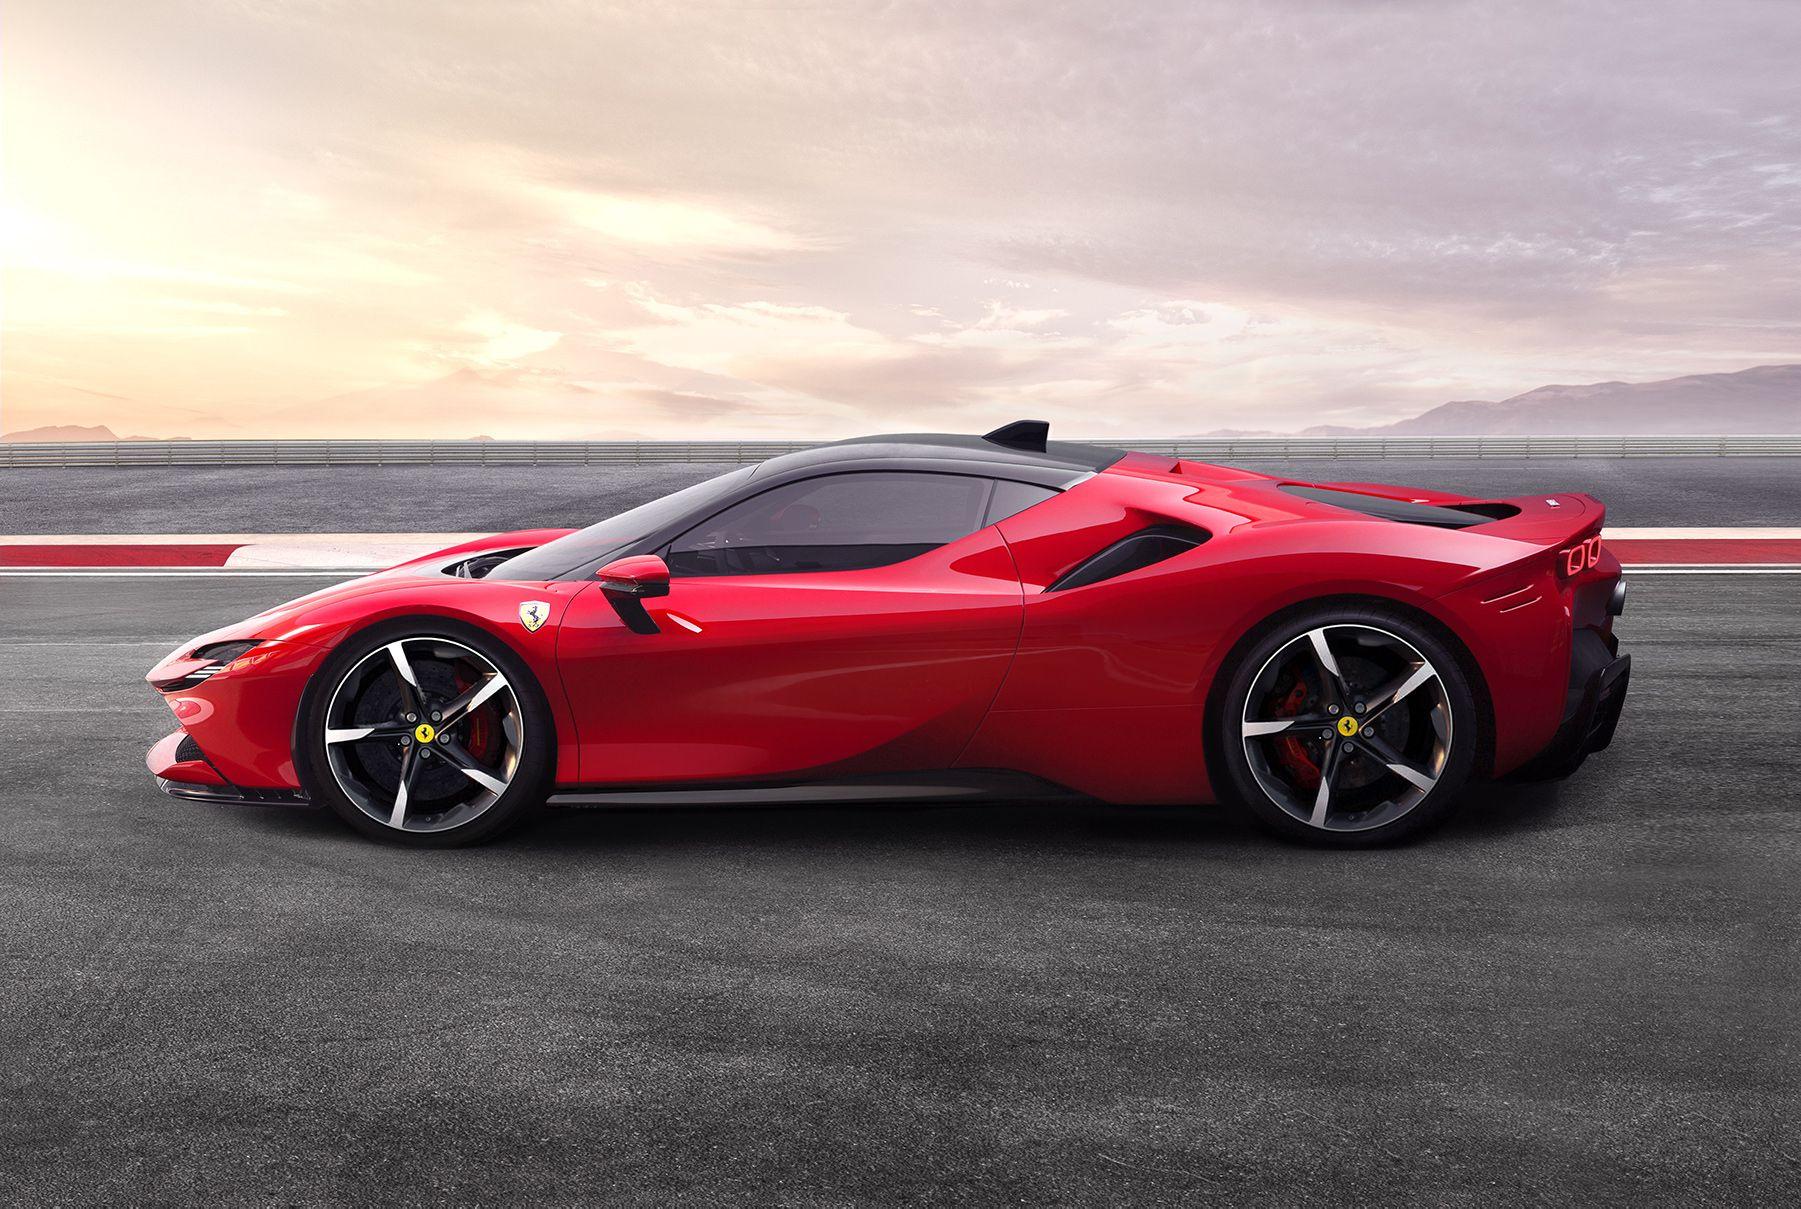 New Ferrari SF90 Stradale PHEV is Most Powerful Ferrari Ever #newferrari